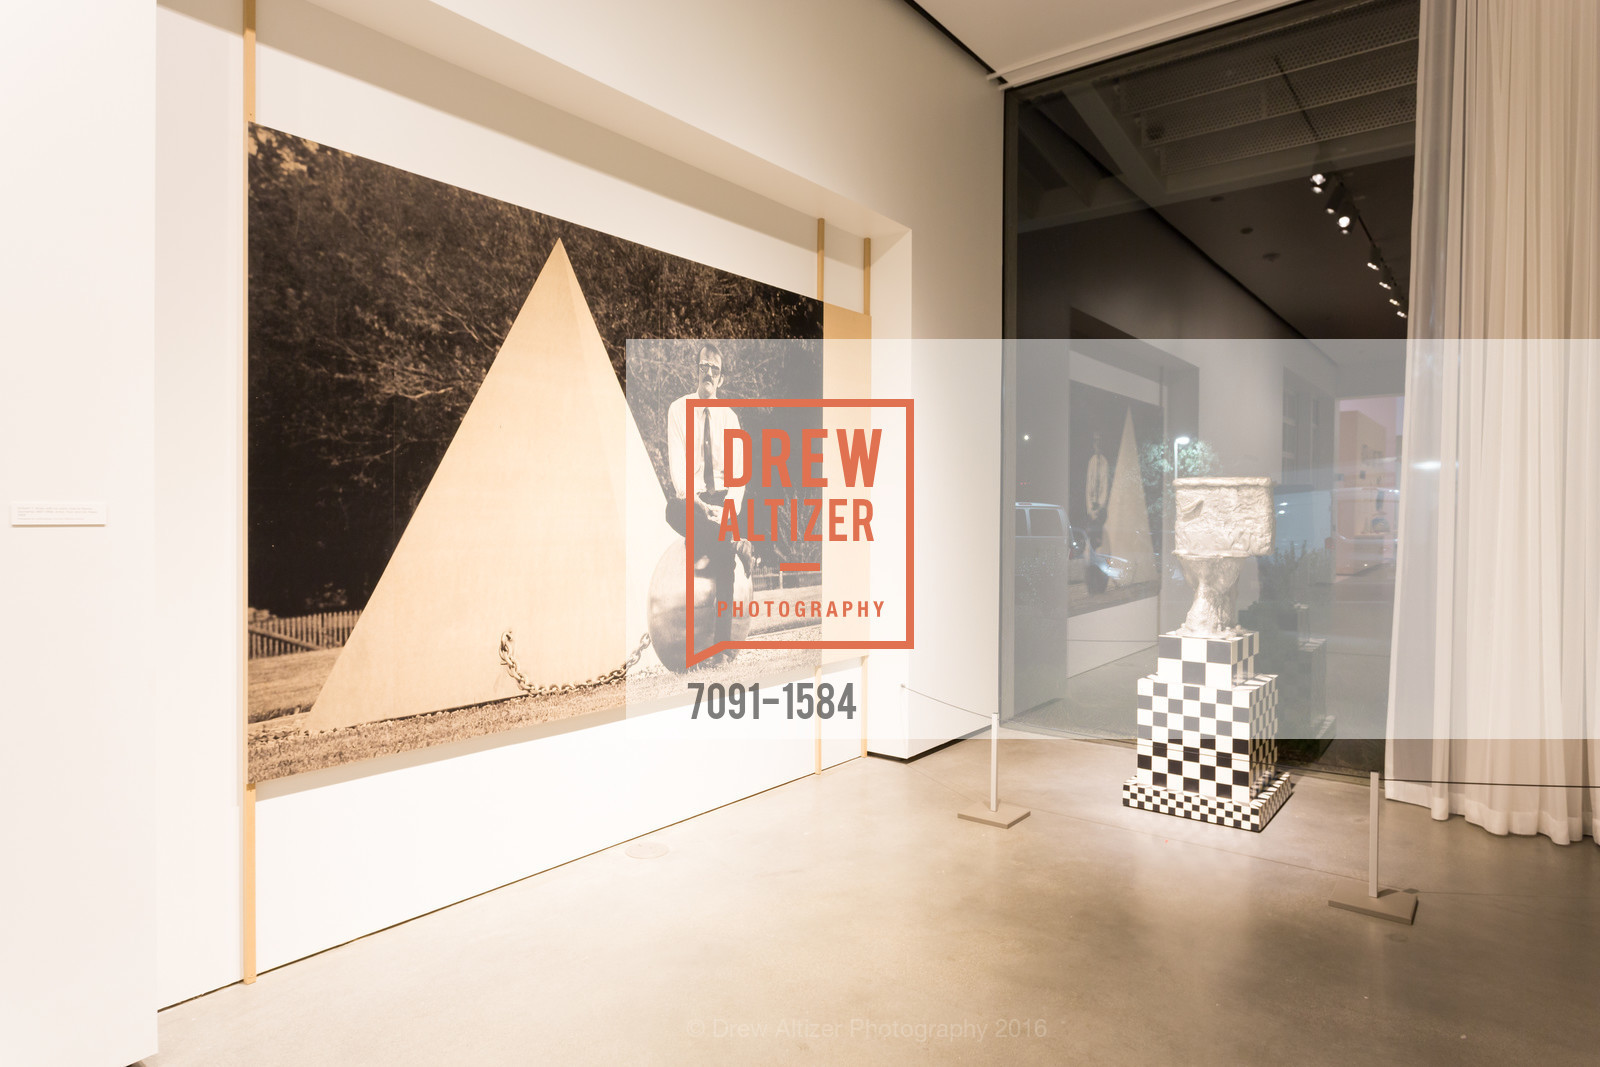 Atmosphere, Director's Debut, Manetti Shrem Museum of Art. Old Davis Road at Alumni Lane, November 12th, 2016